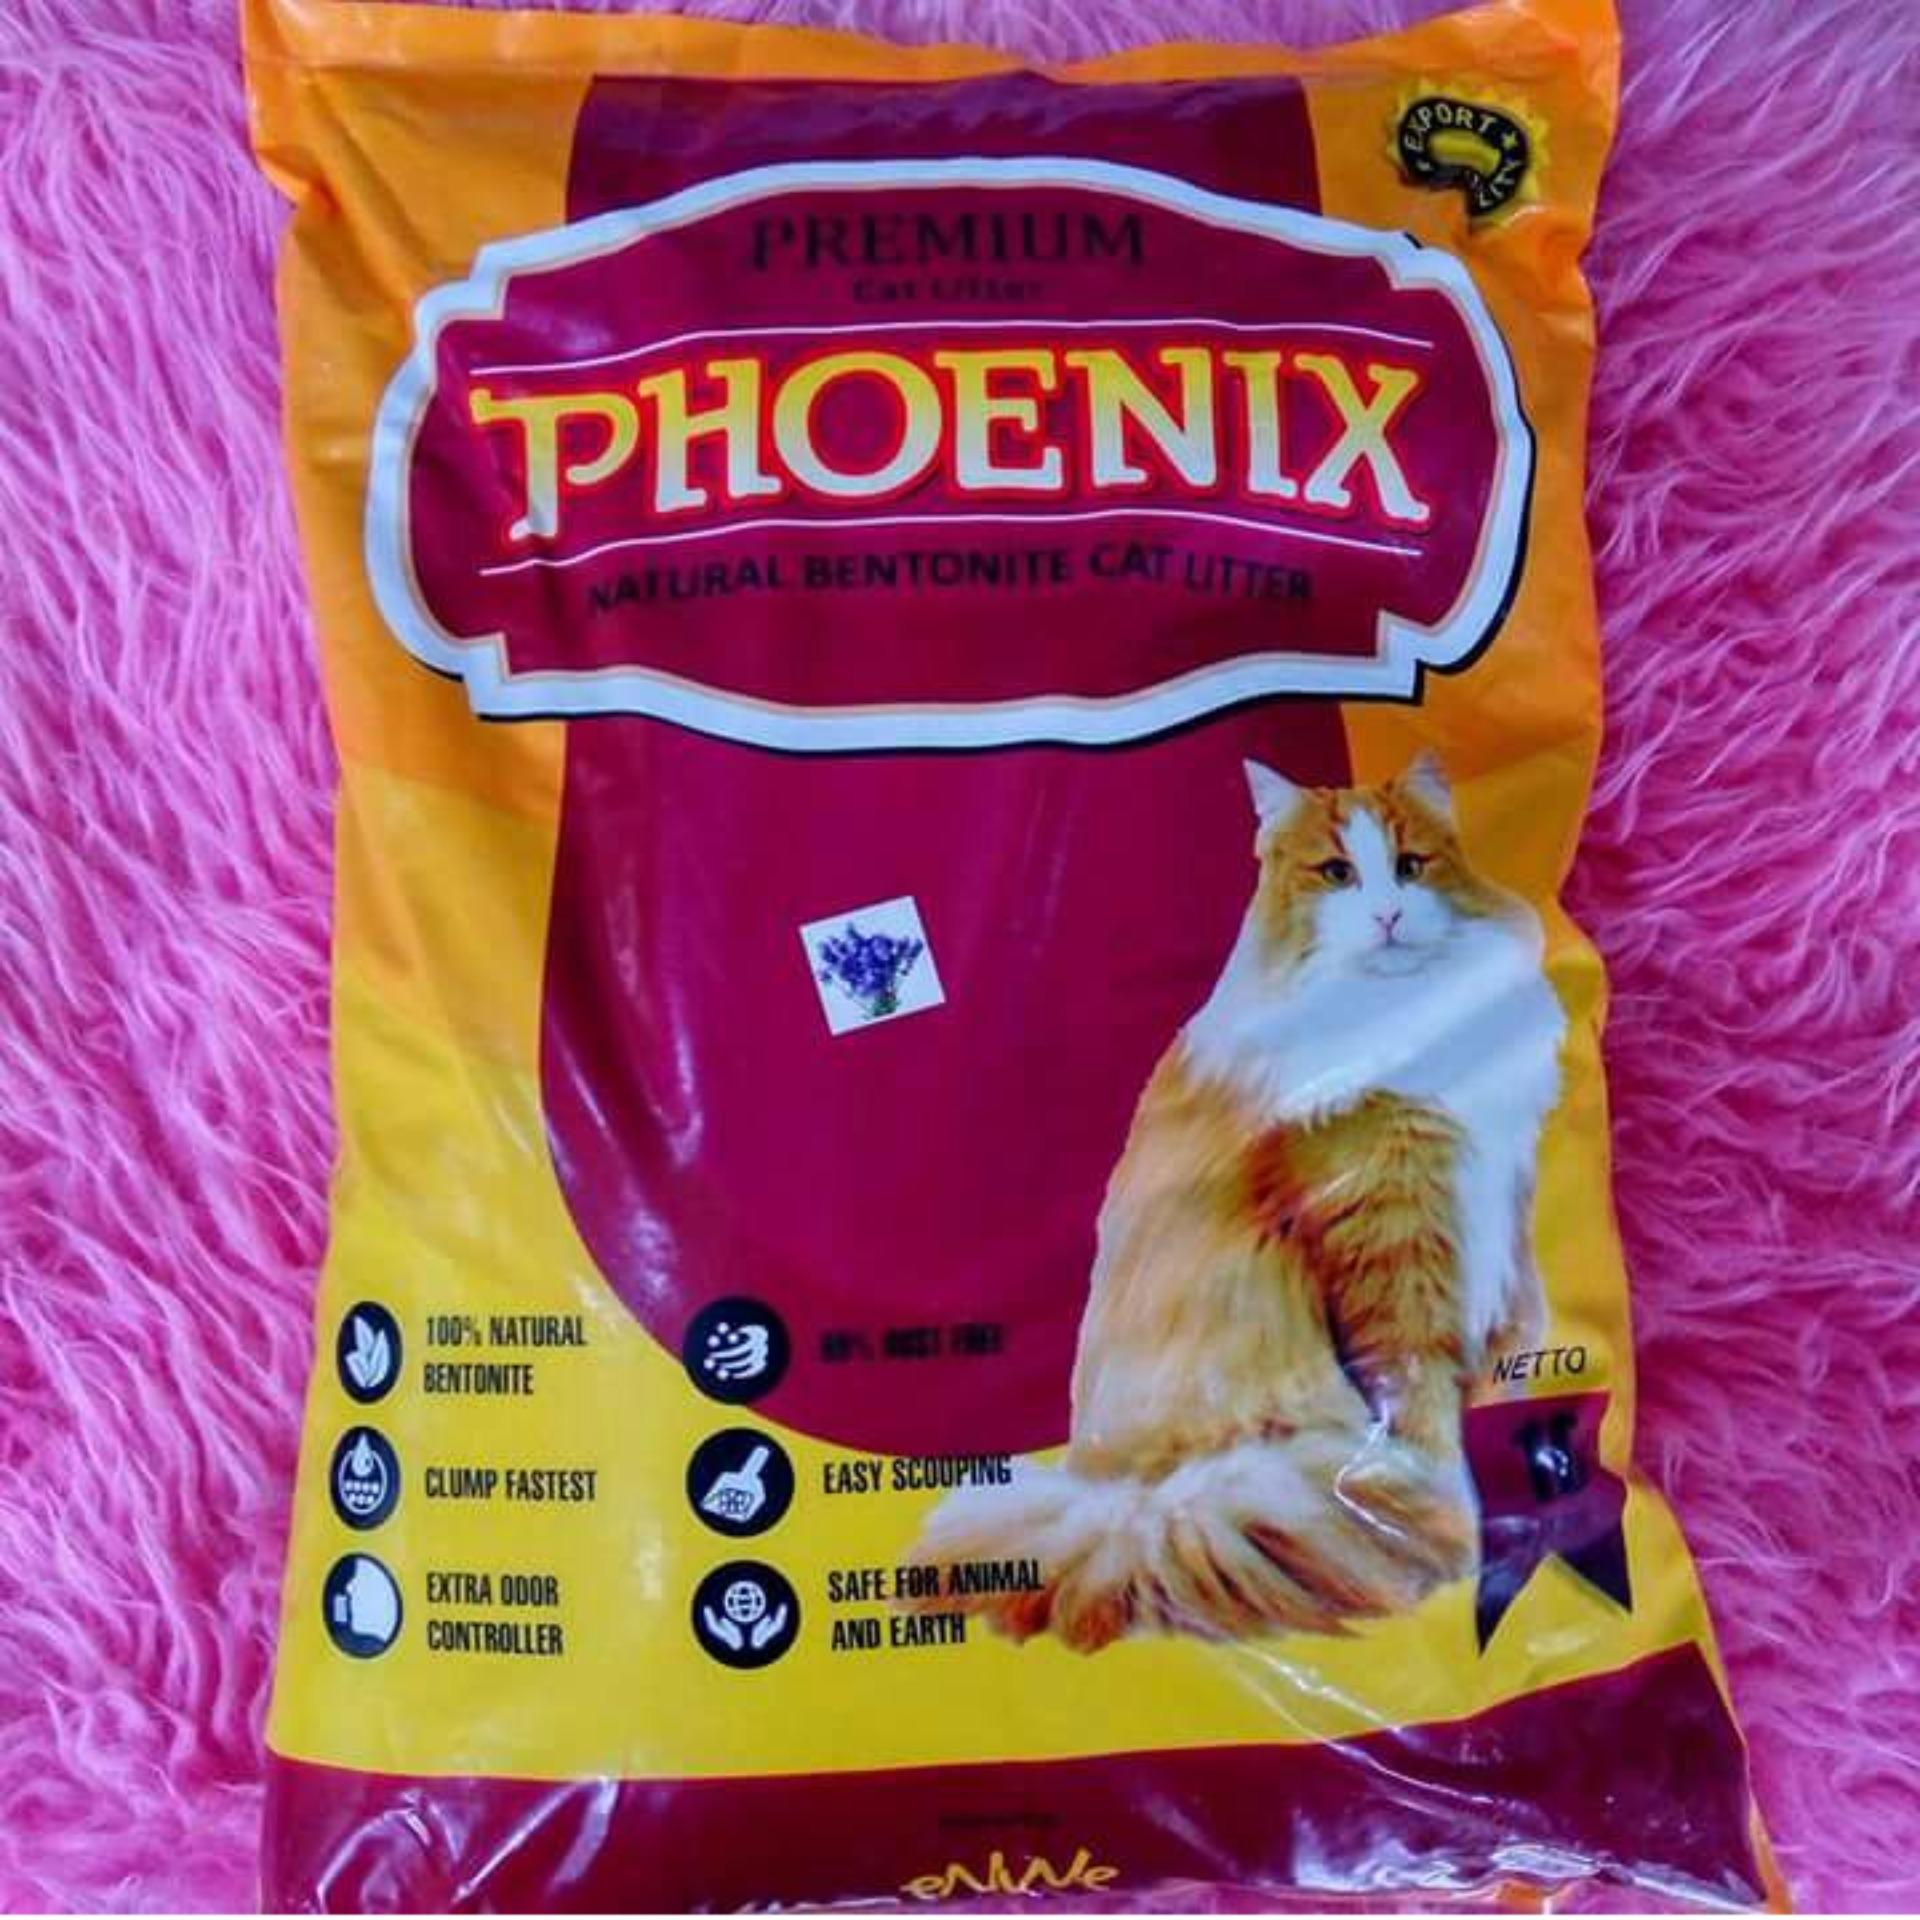 Toko Phoenix Pasir Kucing Cat Litter Gumpal Aroma 10 Liter Lengkap Di Dki Jakarta